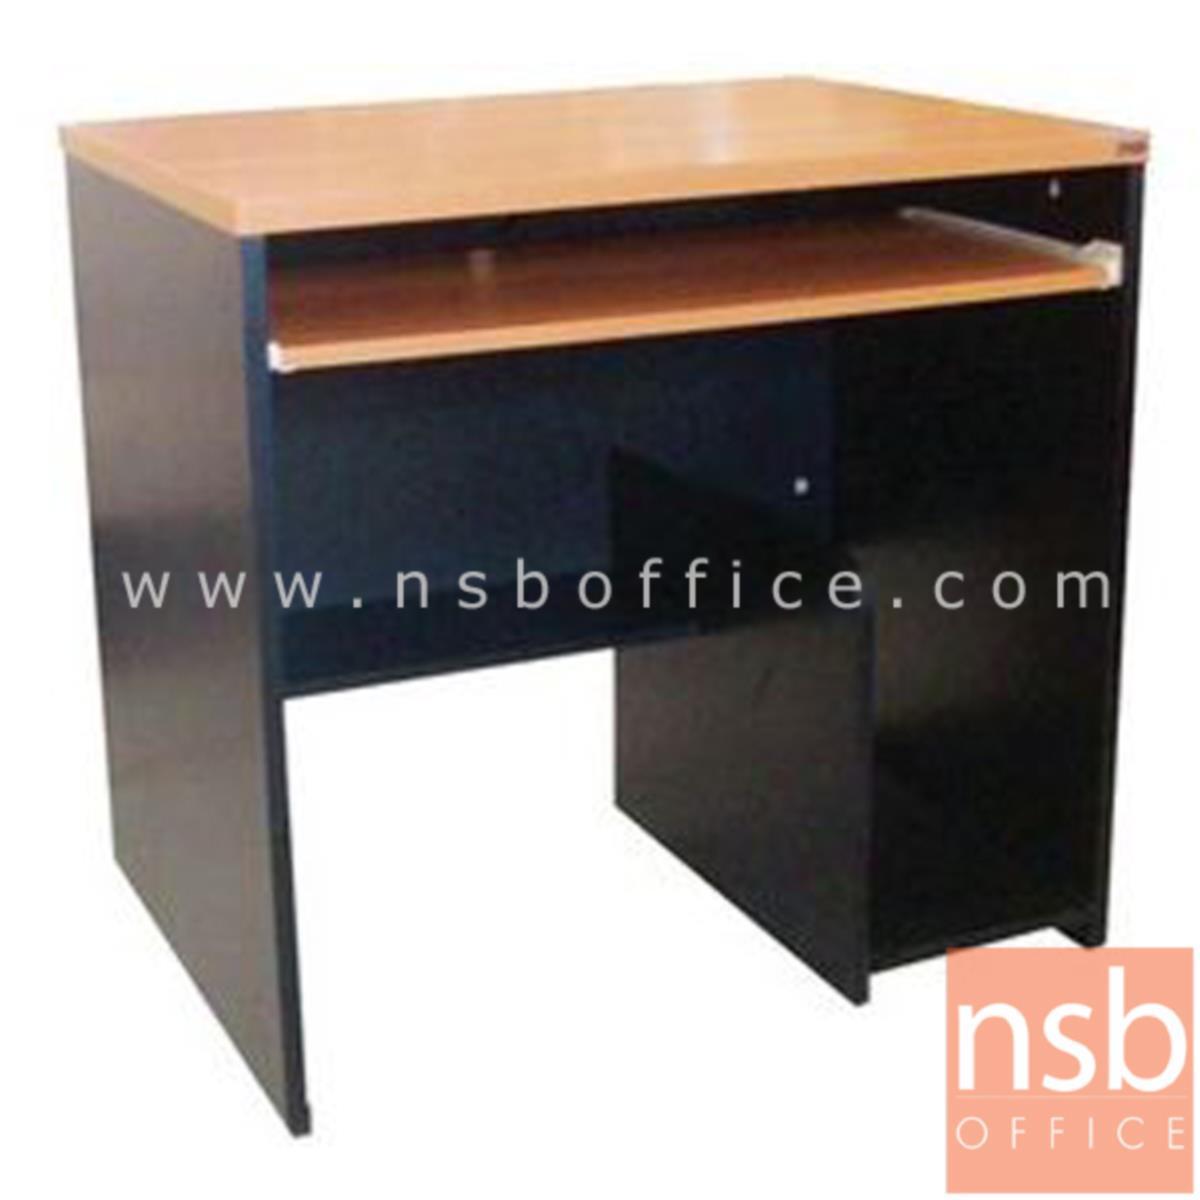 A16A019:โต๊ะคอมพิวเตอร์  รุ่น Morrison (มอริสัน) ขนาด 80W cm. พร้อมรางคีบอร์ดและที่วางซีพียู